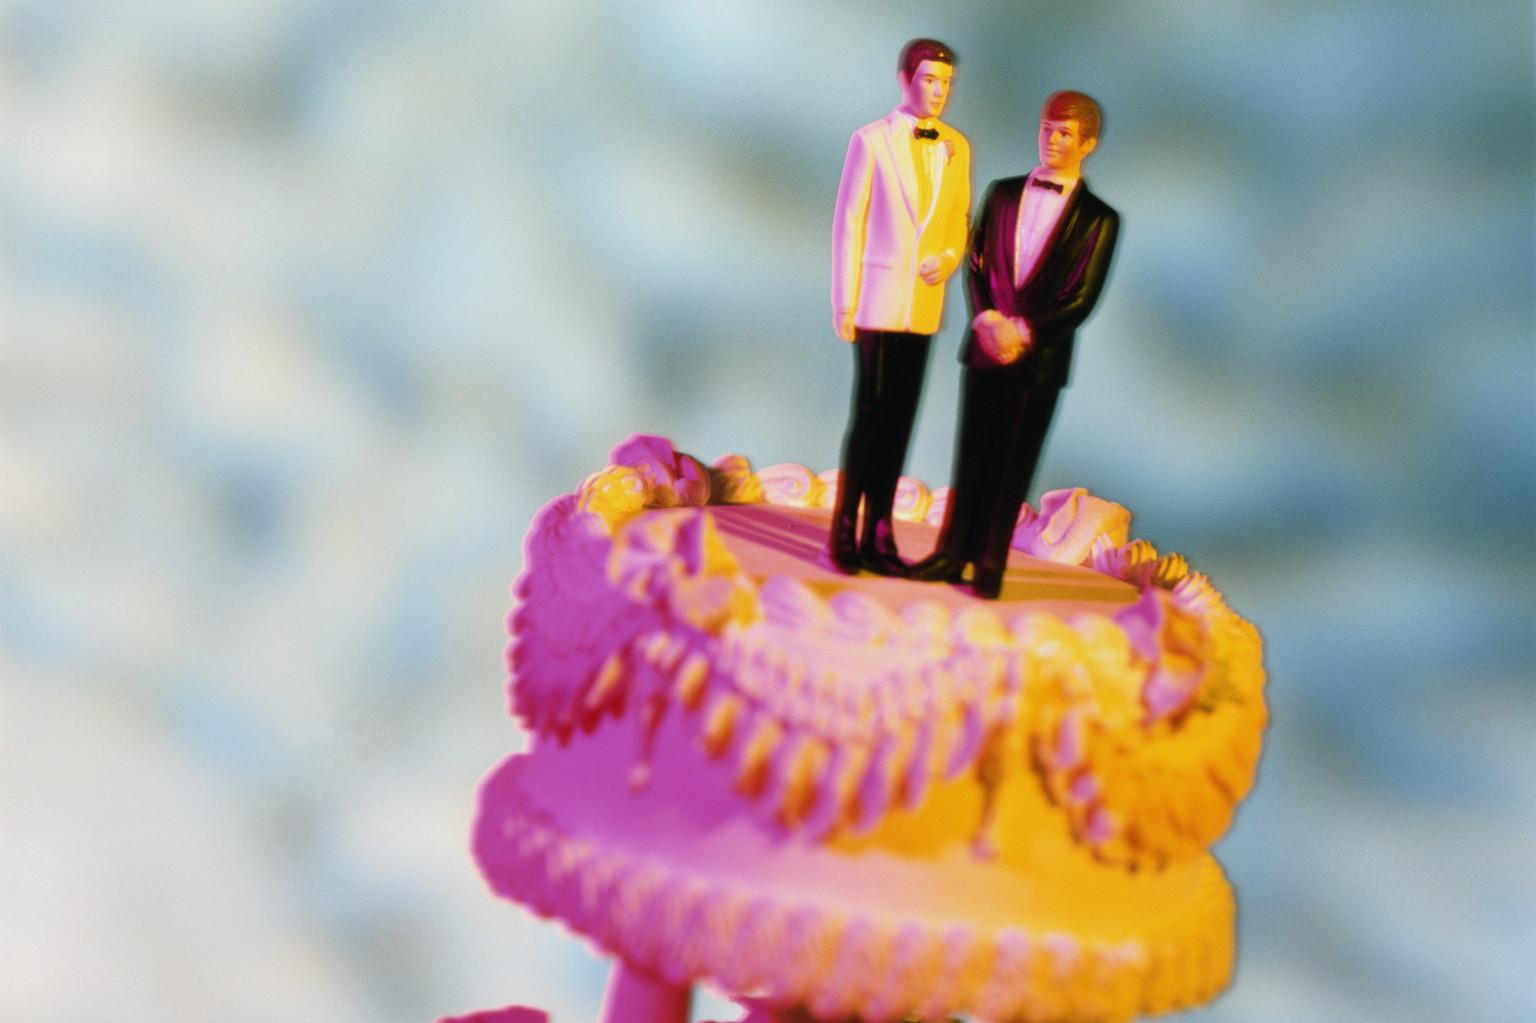 belle bite gay sodomie gay gratuit